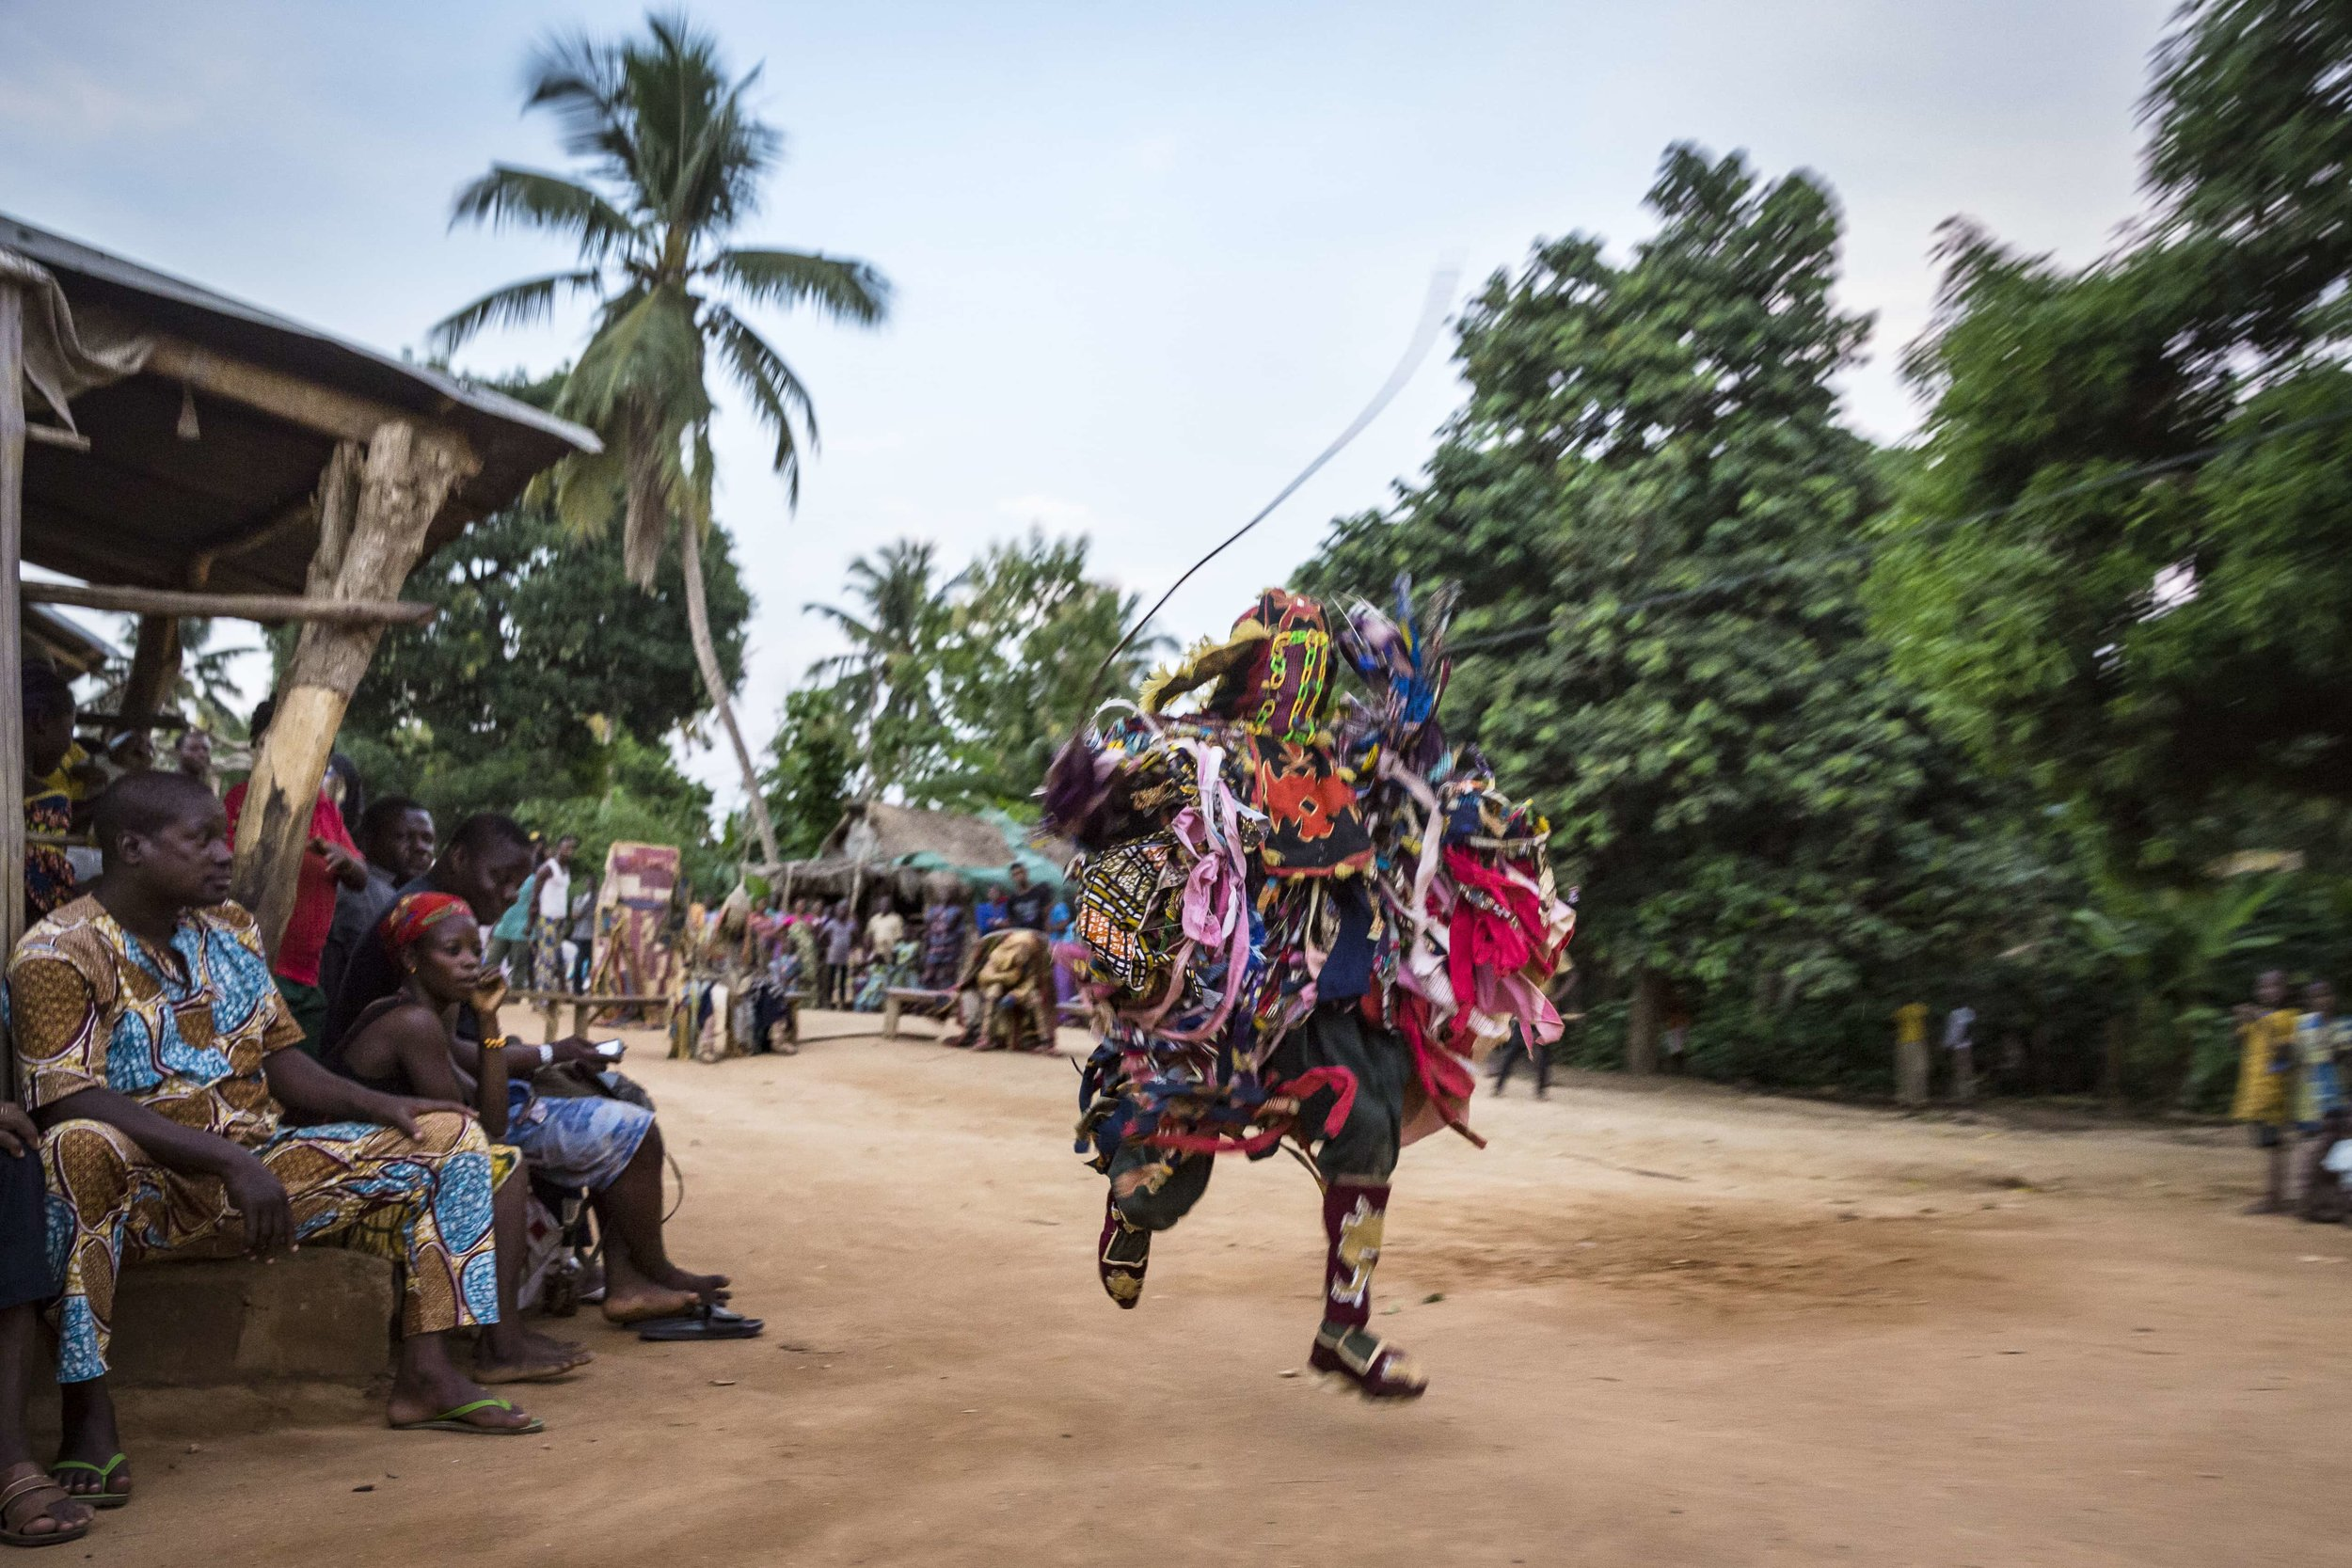 documentary-reportage-photography-voodoo-fabio-burrelli-14.jpg